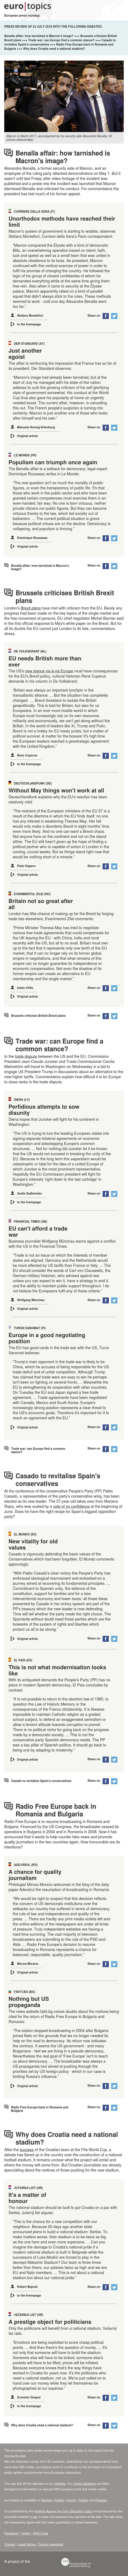 euro topics: Benalla affair: how tarnished is Macron's image? (23/07/2018)